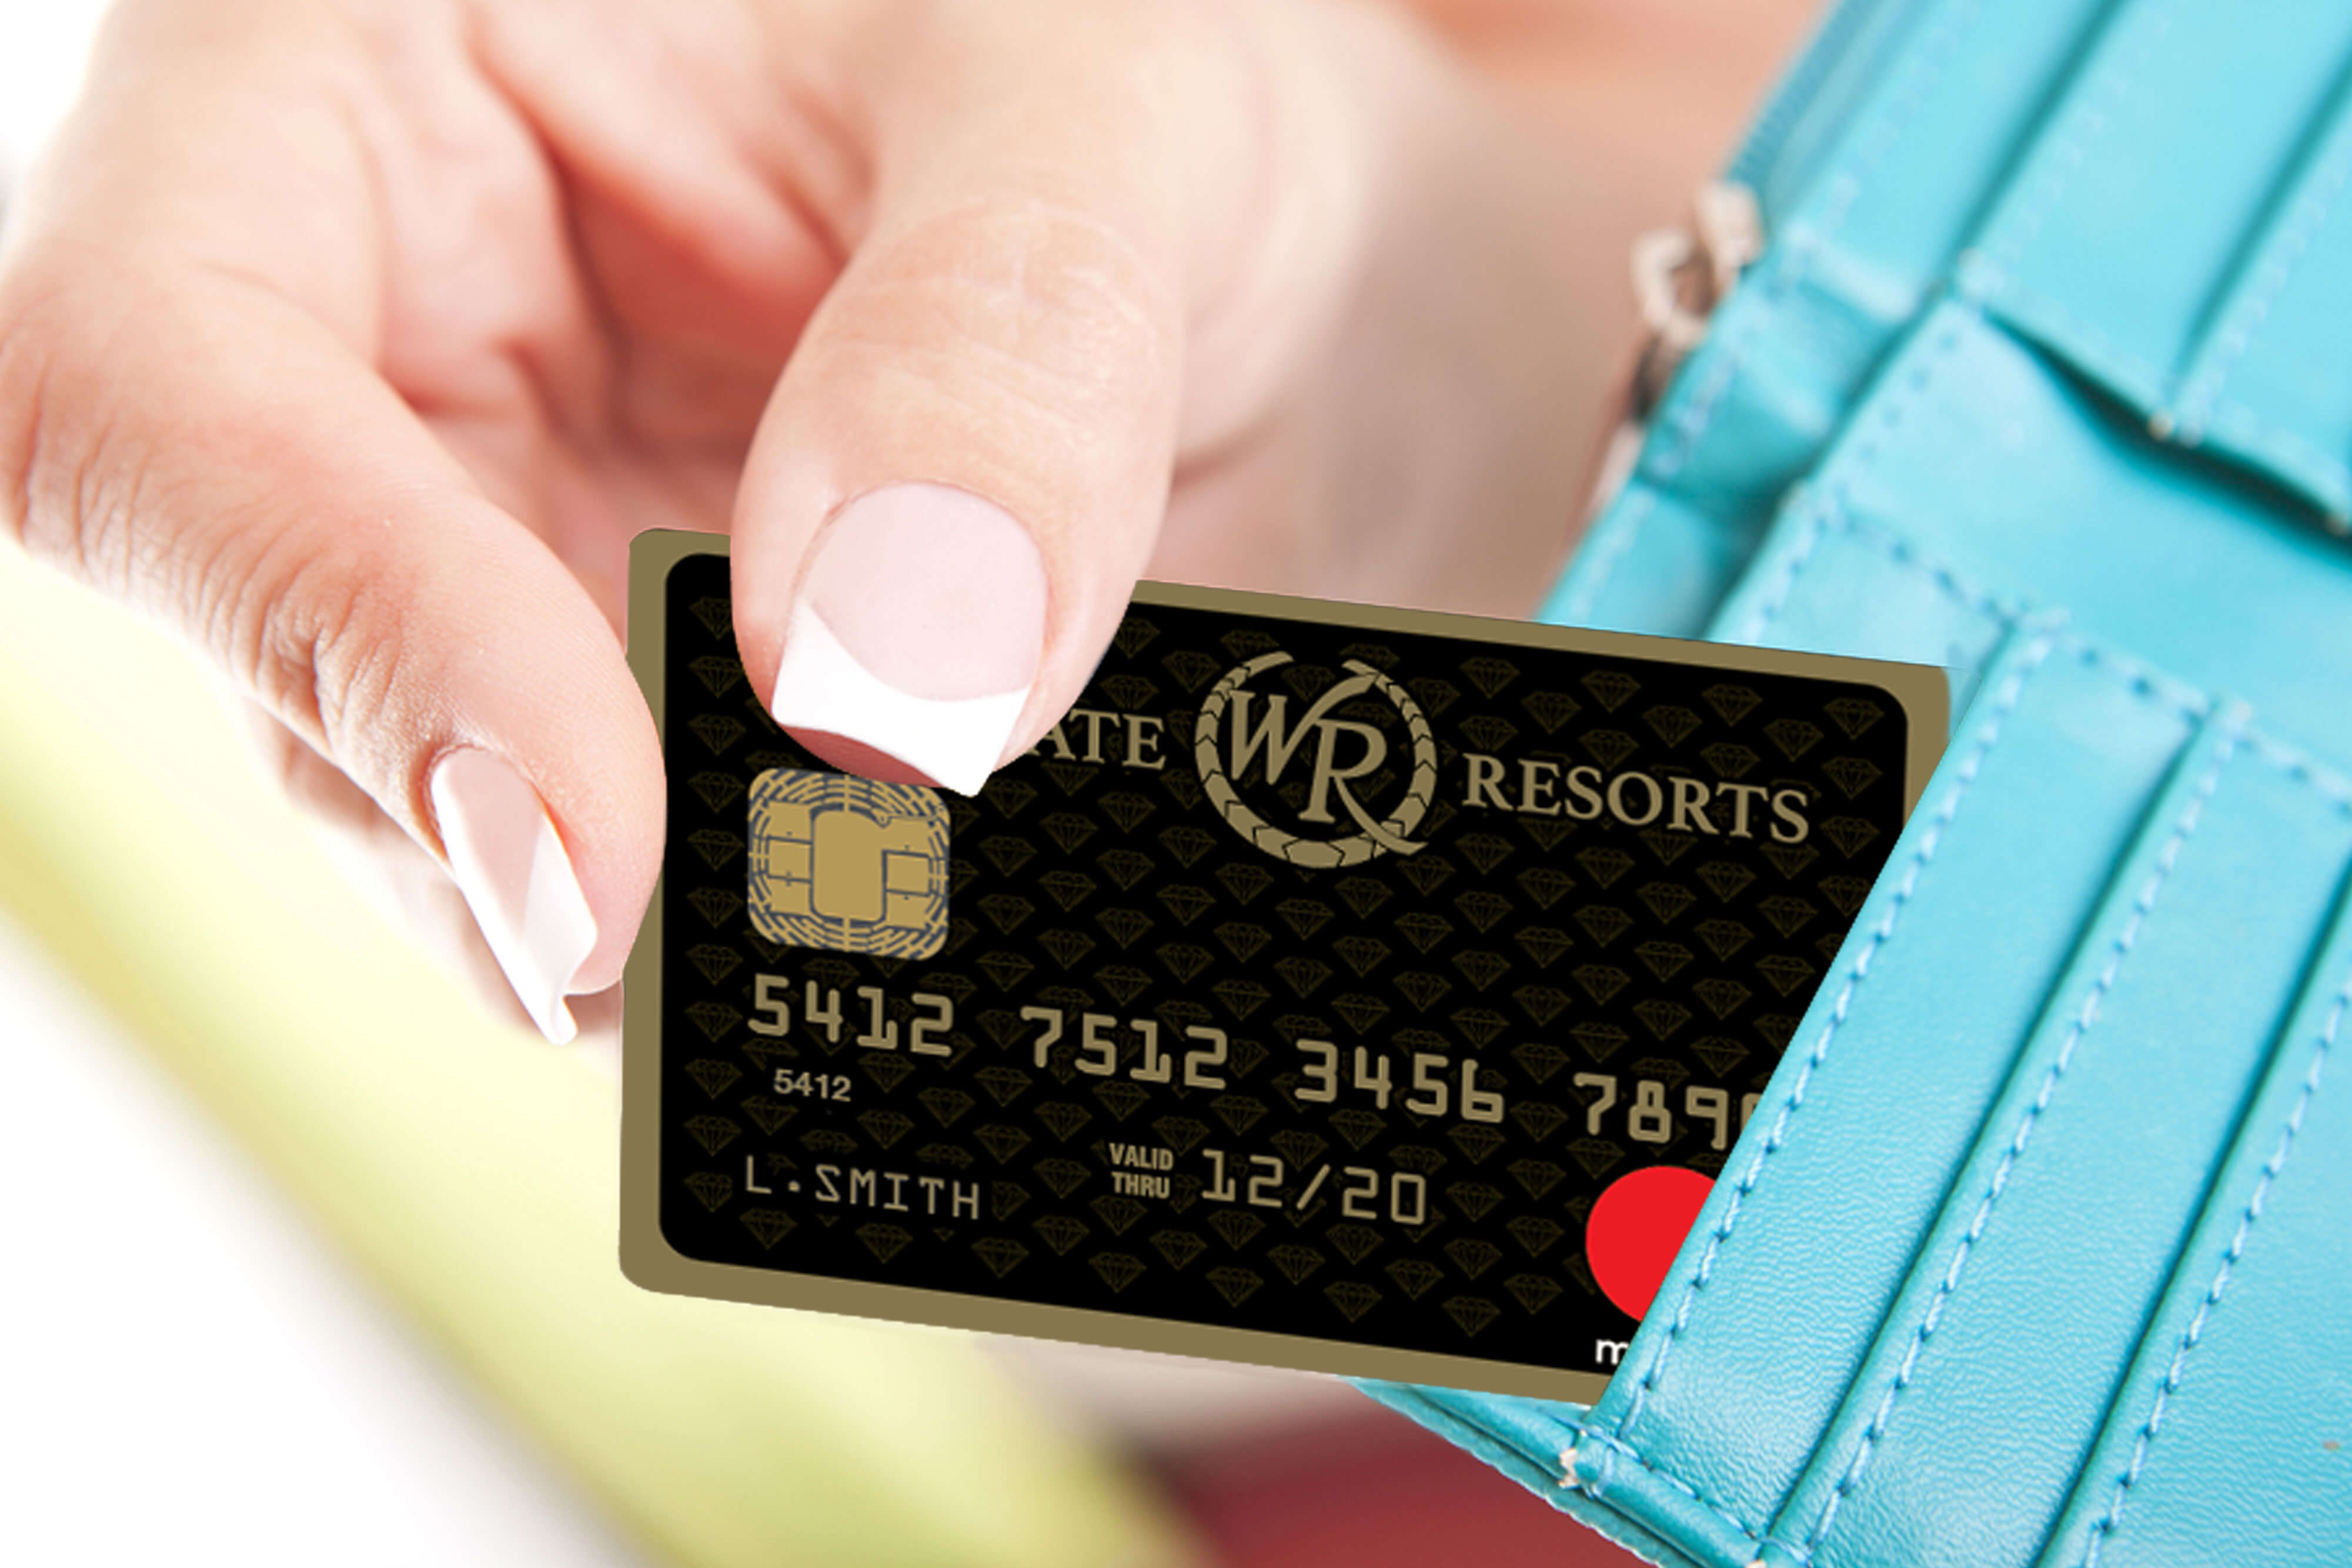 Westgate credit card - Westgate Lakes Resort